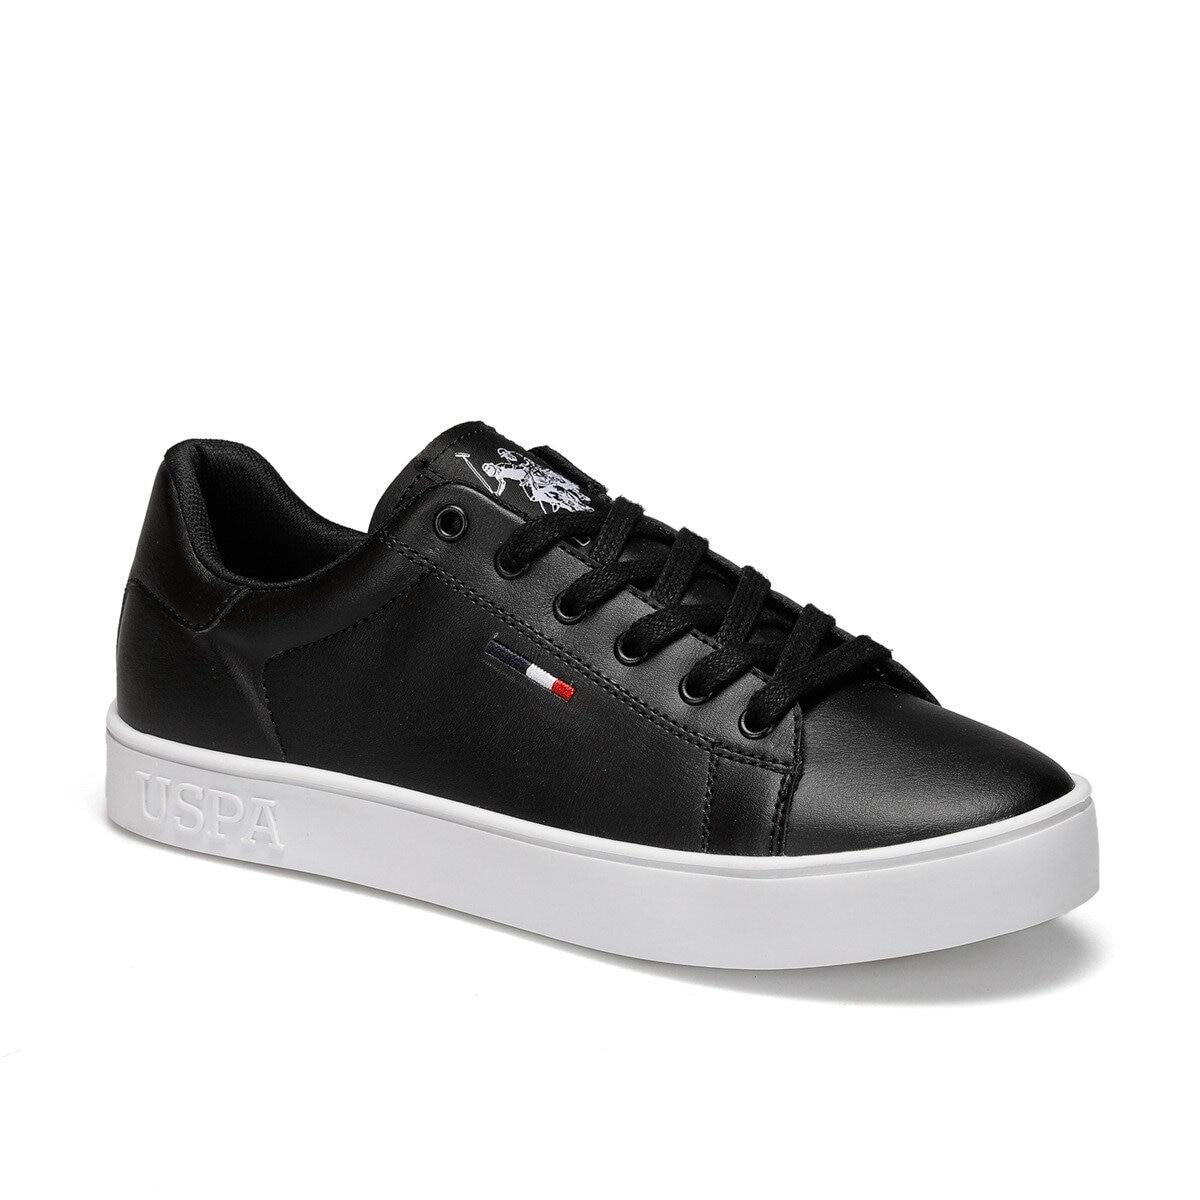 FLO FLEX Black Women 'S Sneaker Shoes U.S. POLO ASSN.